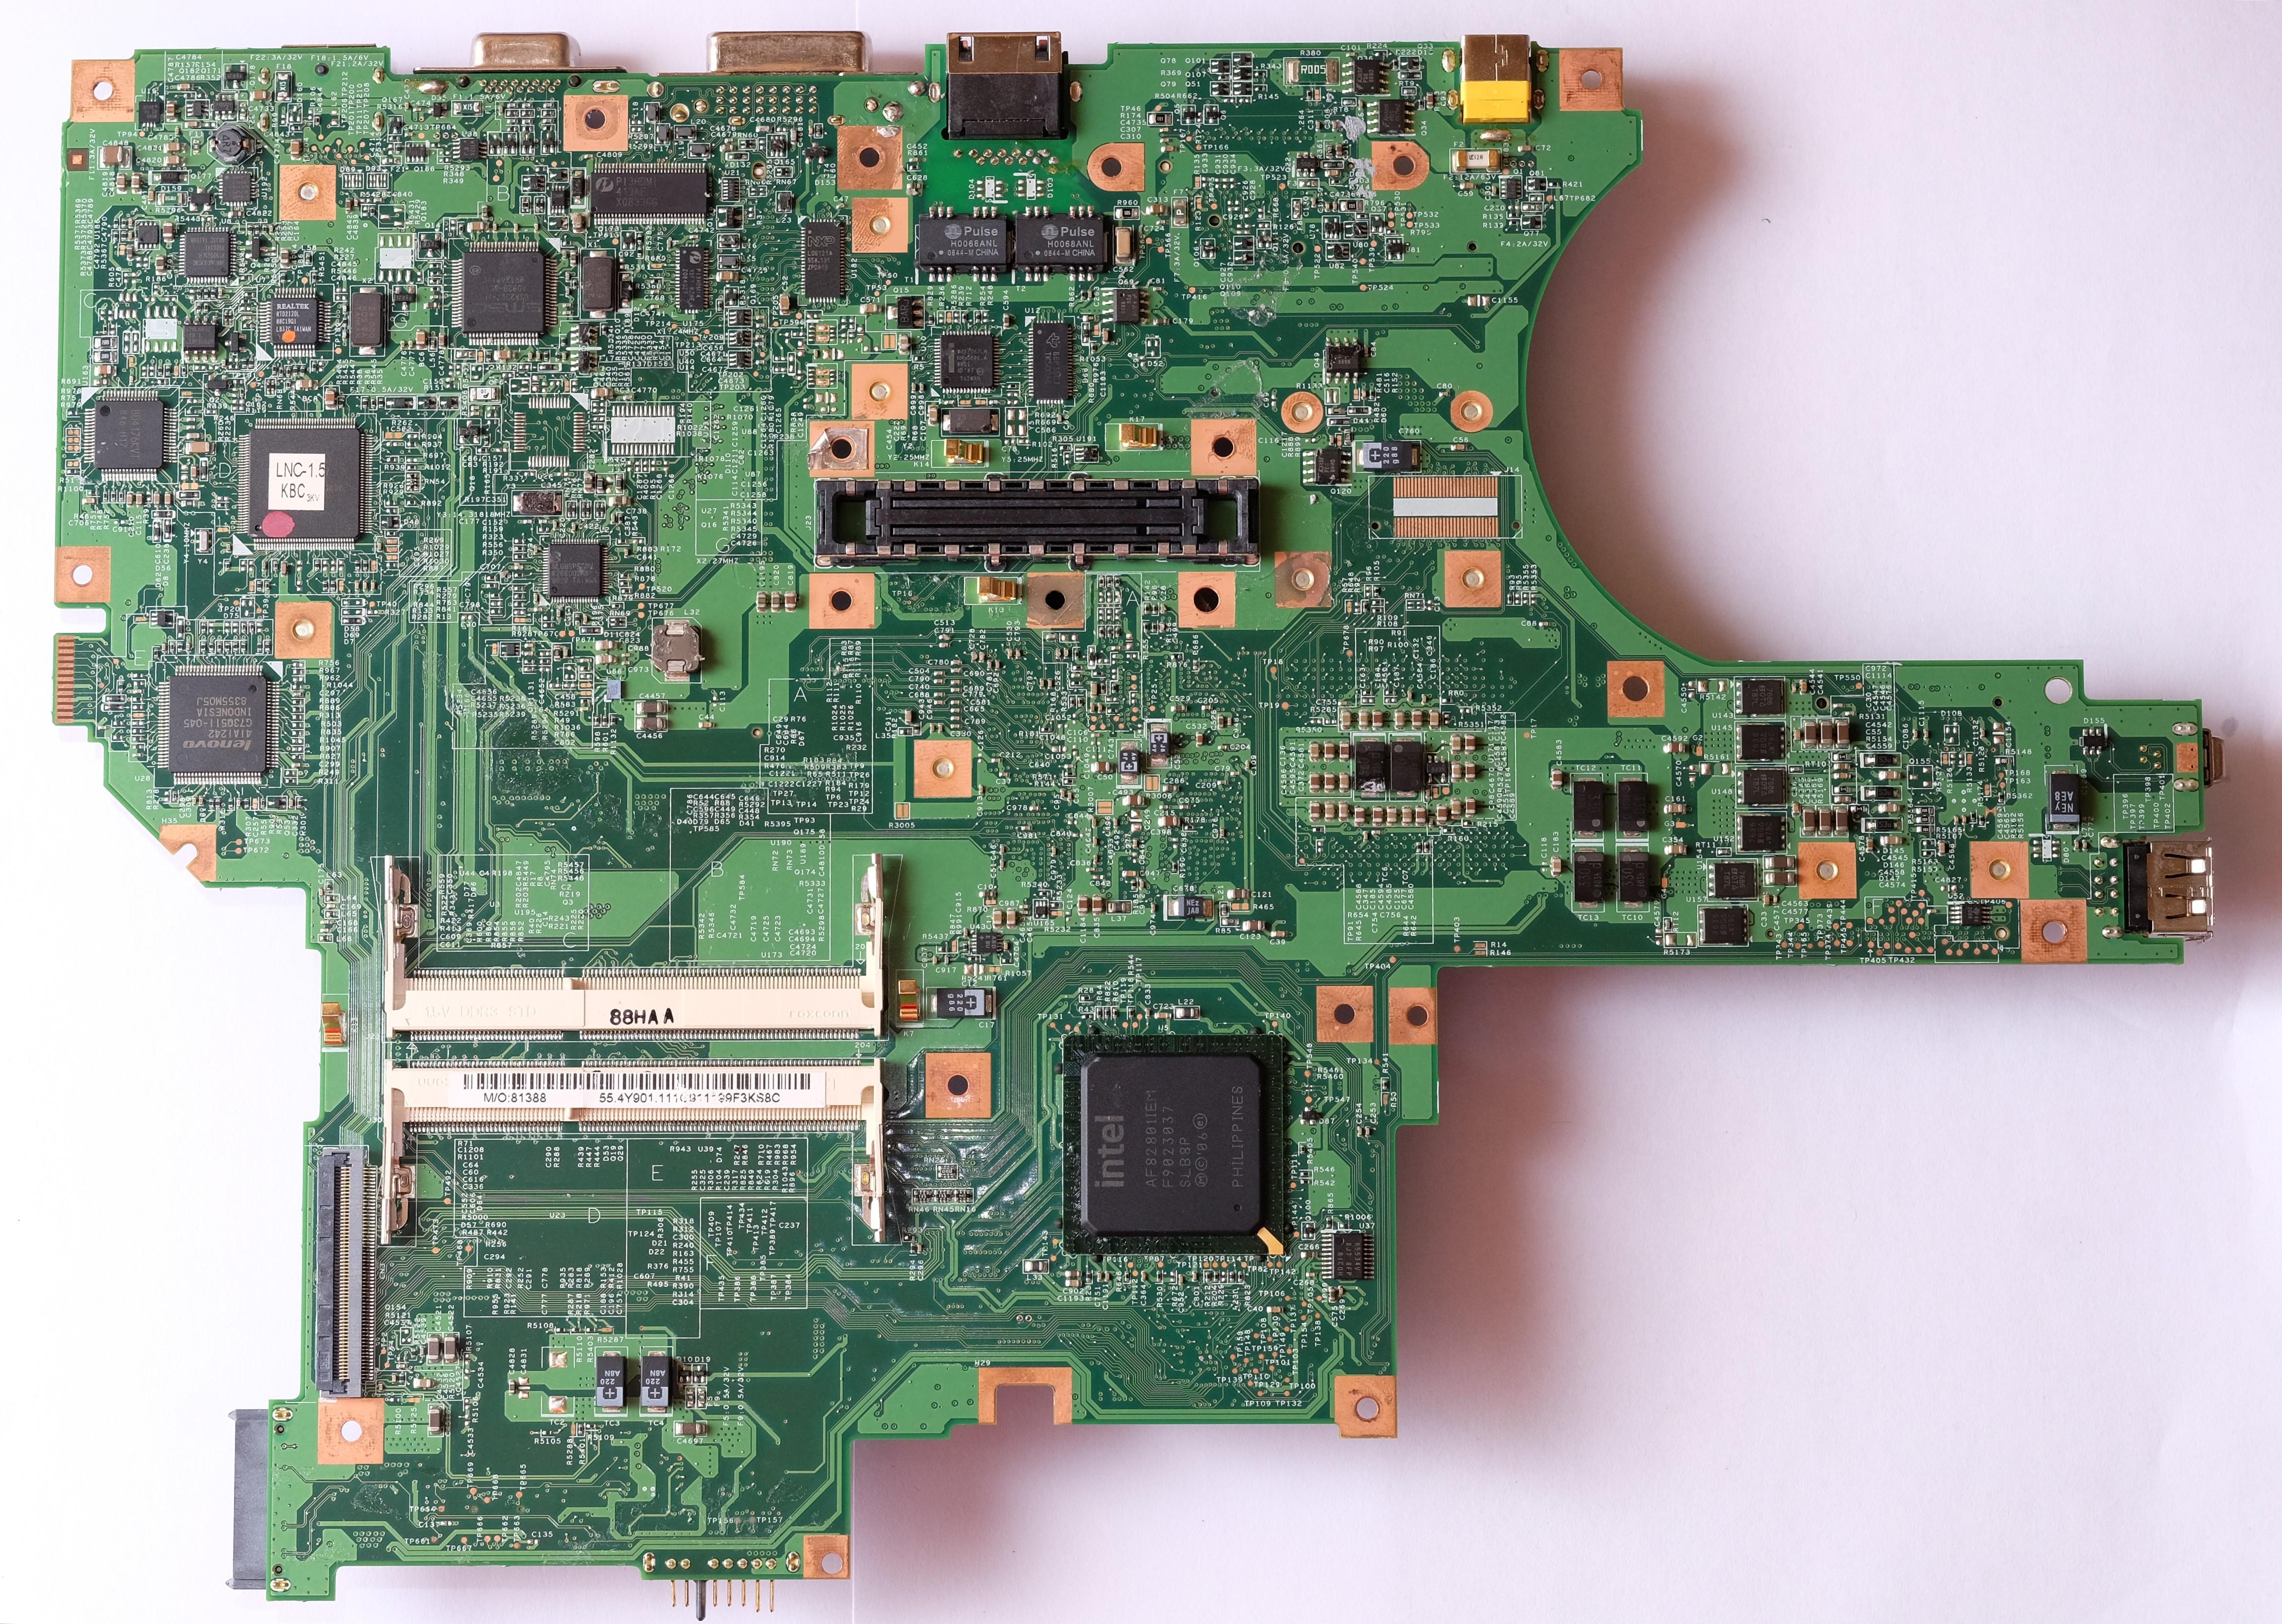 Lenovo thinkpad W700ds - NotABug org: Free code hosting